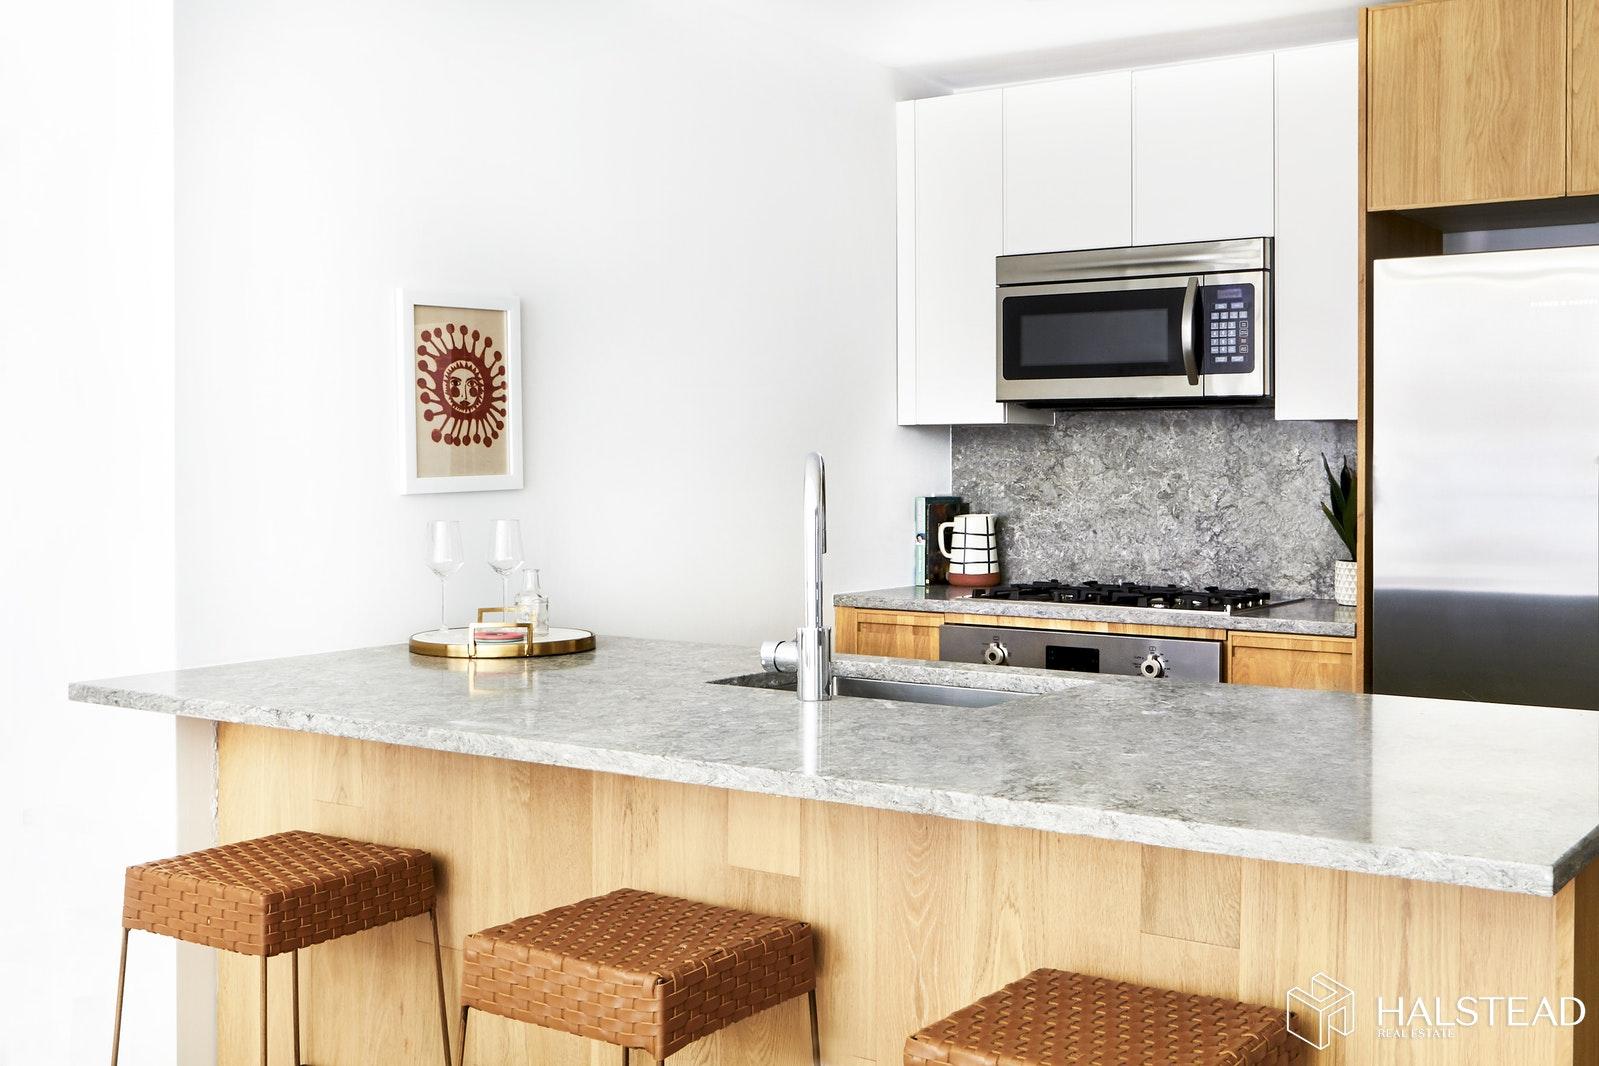 264 Webster Avenue, 201 - Kensington, New York